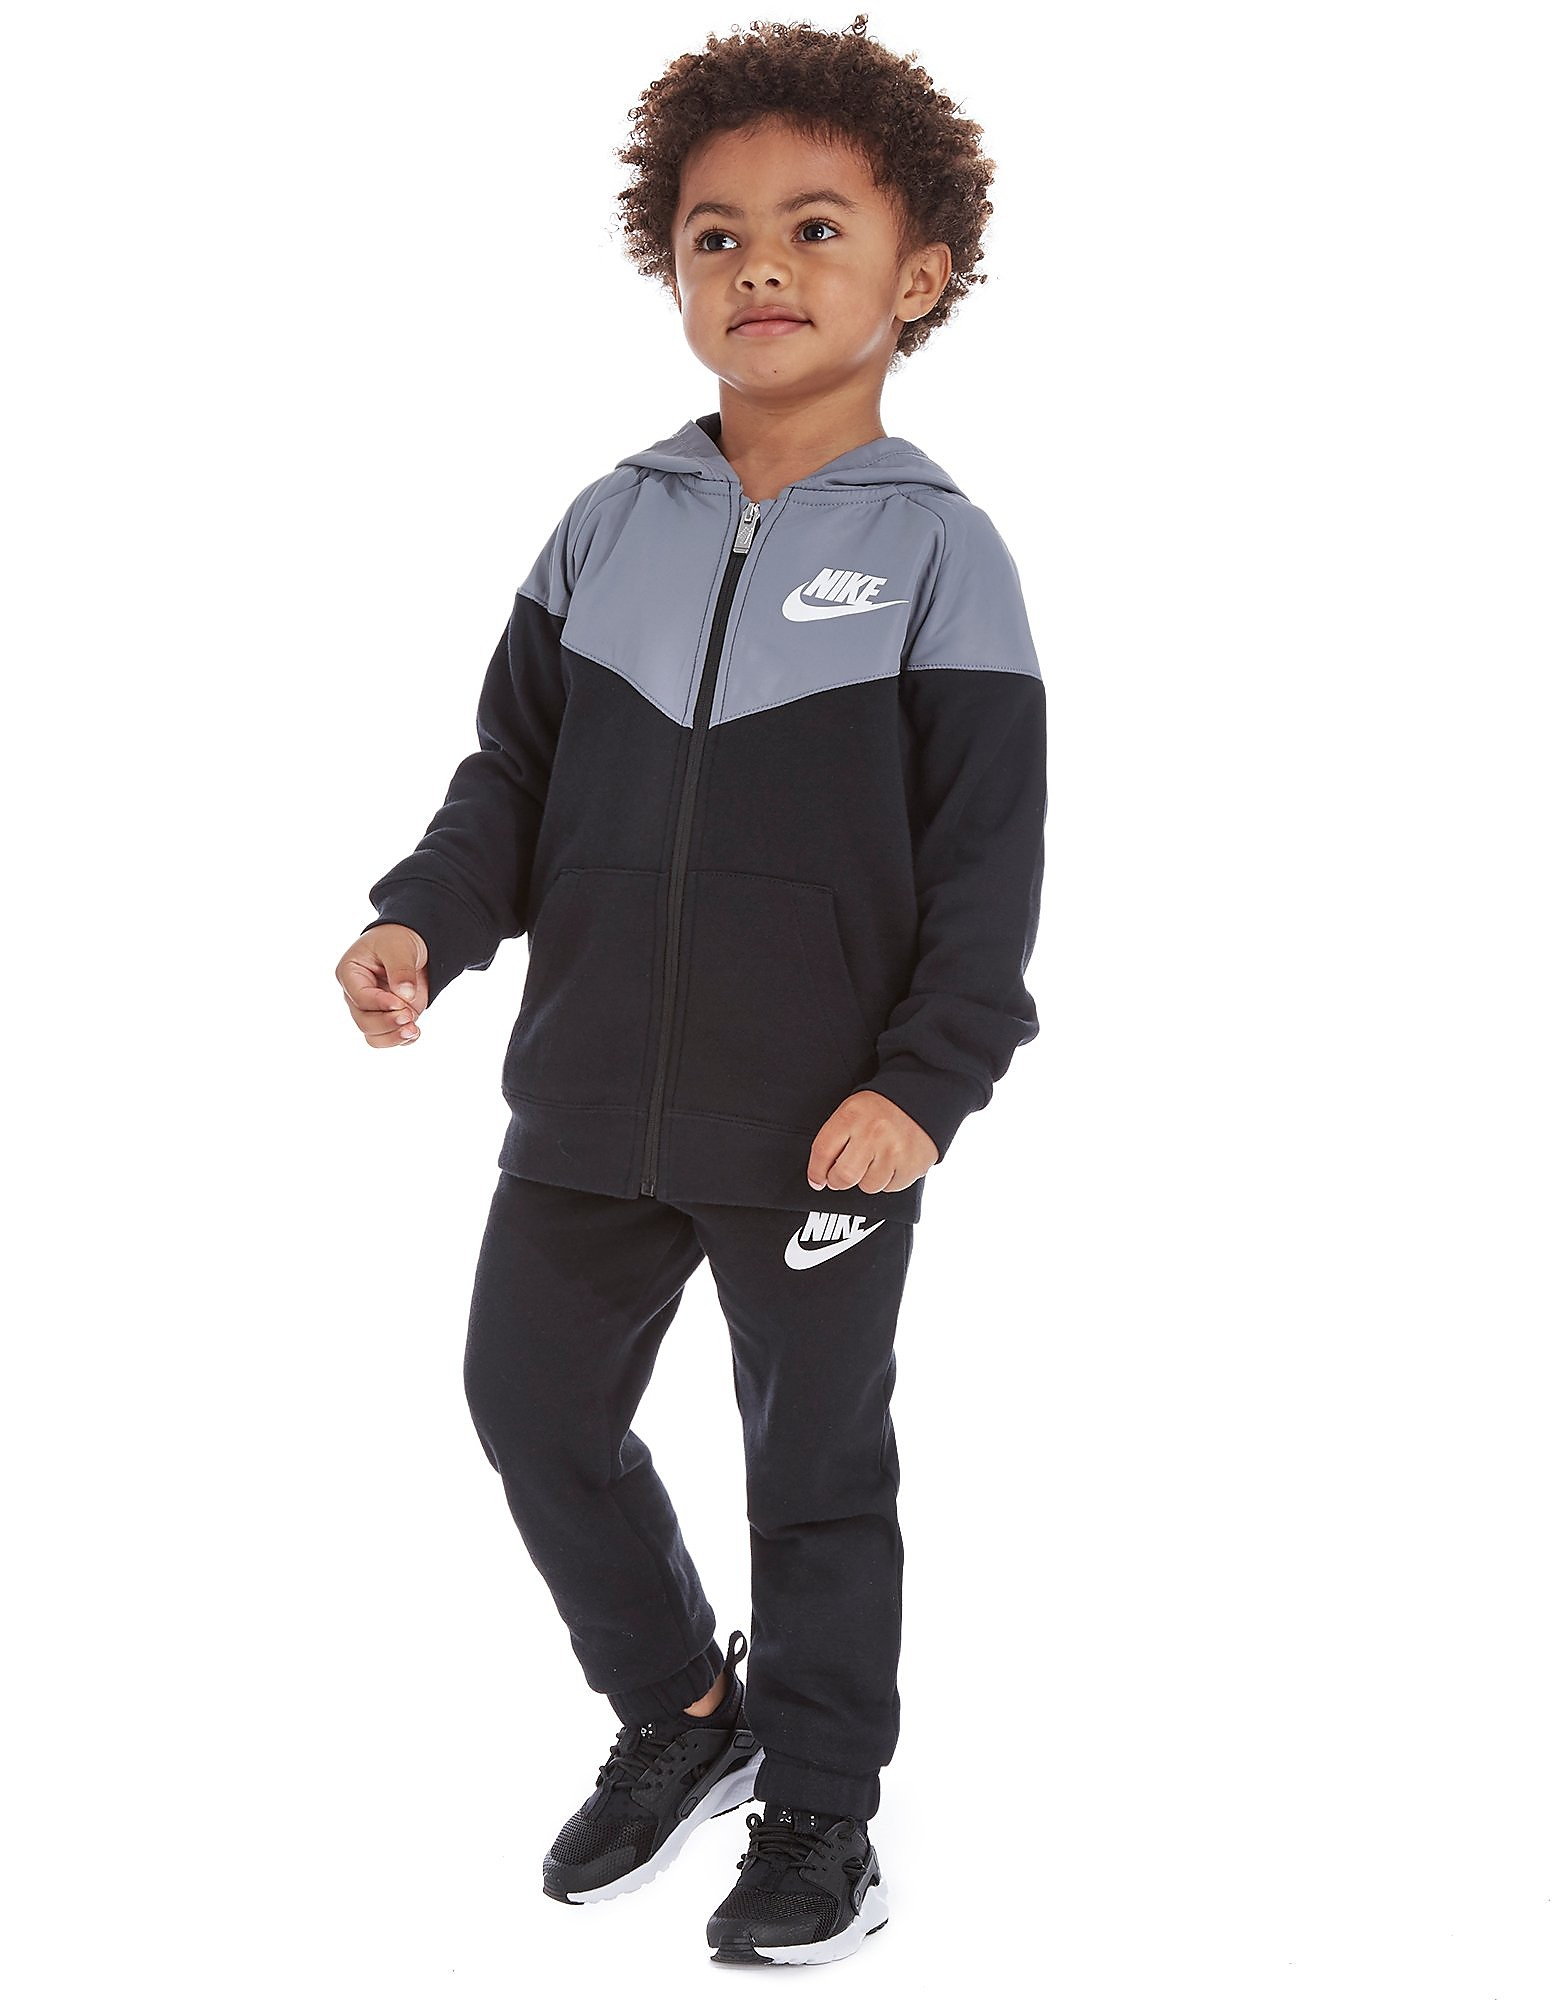 Nike Hybrid Trainingsanzug Mit Durchgehendem RV Kinder